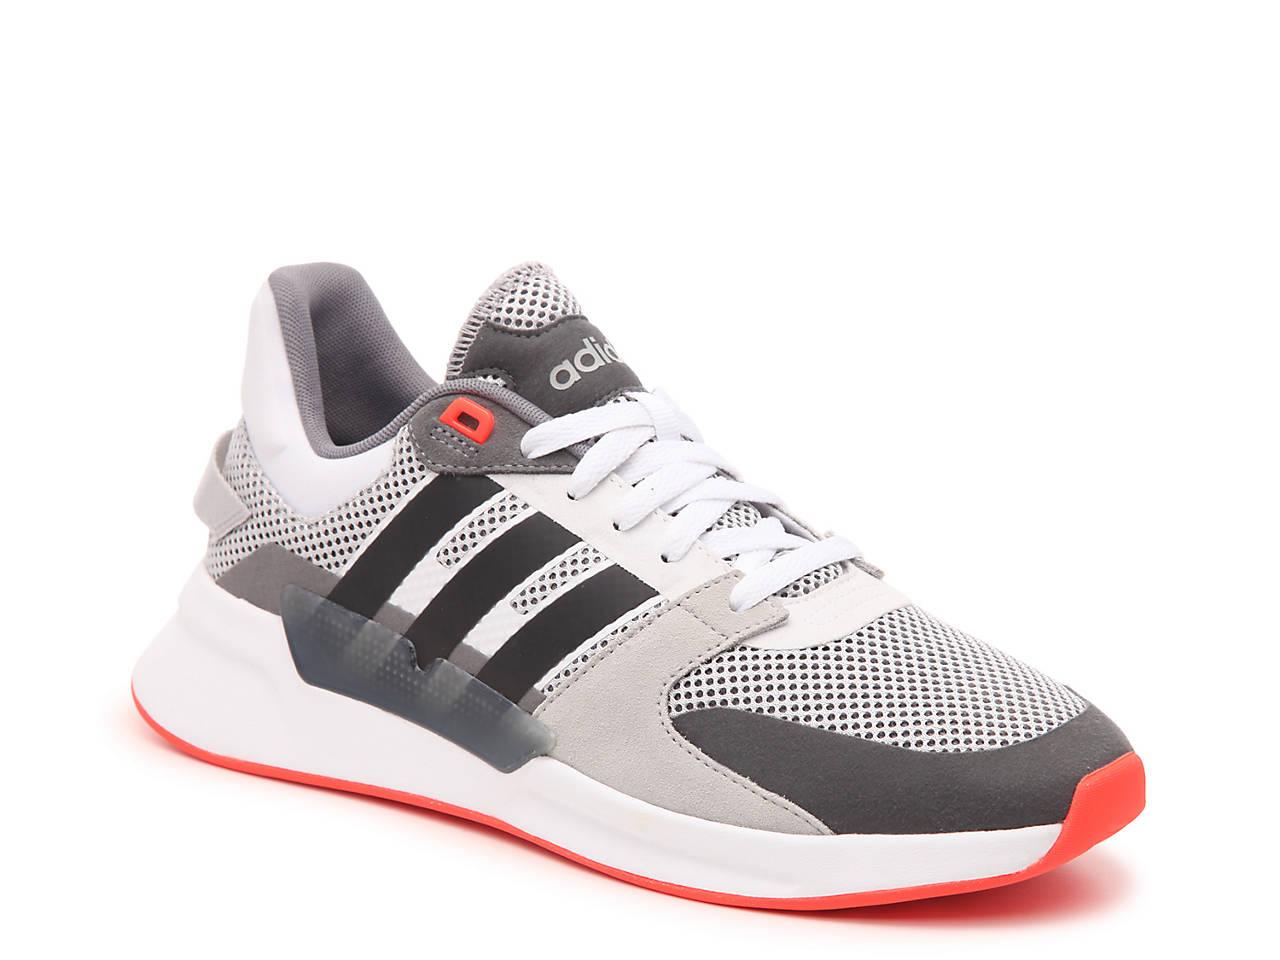 b1bd680825 Run 90S Sneaker - Men's